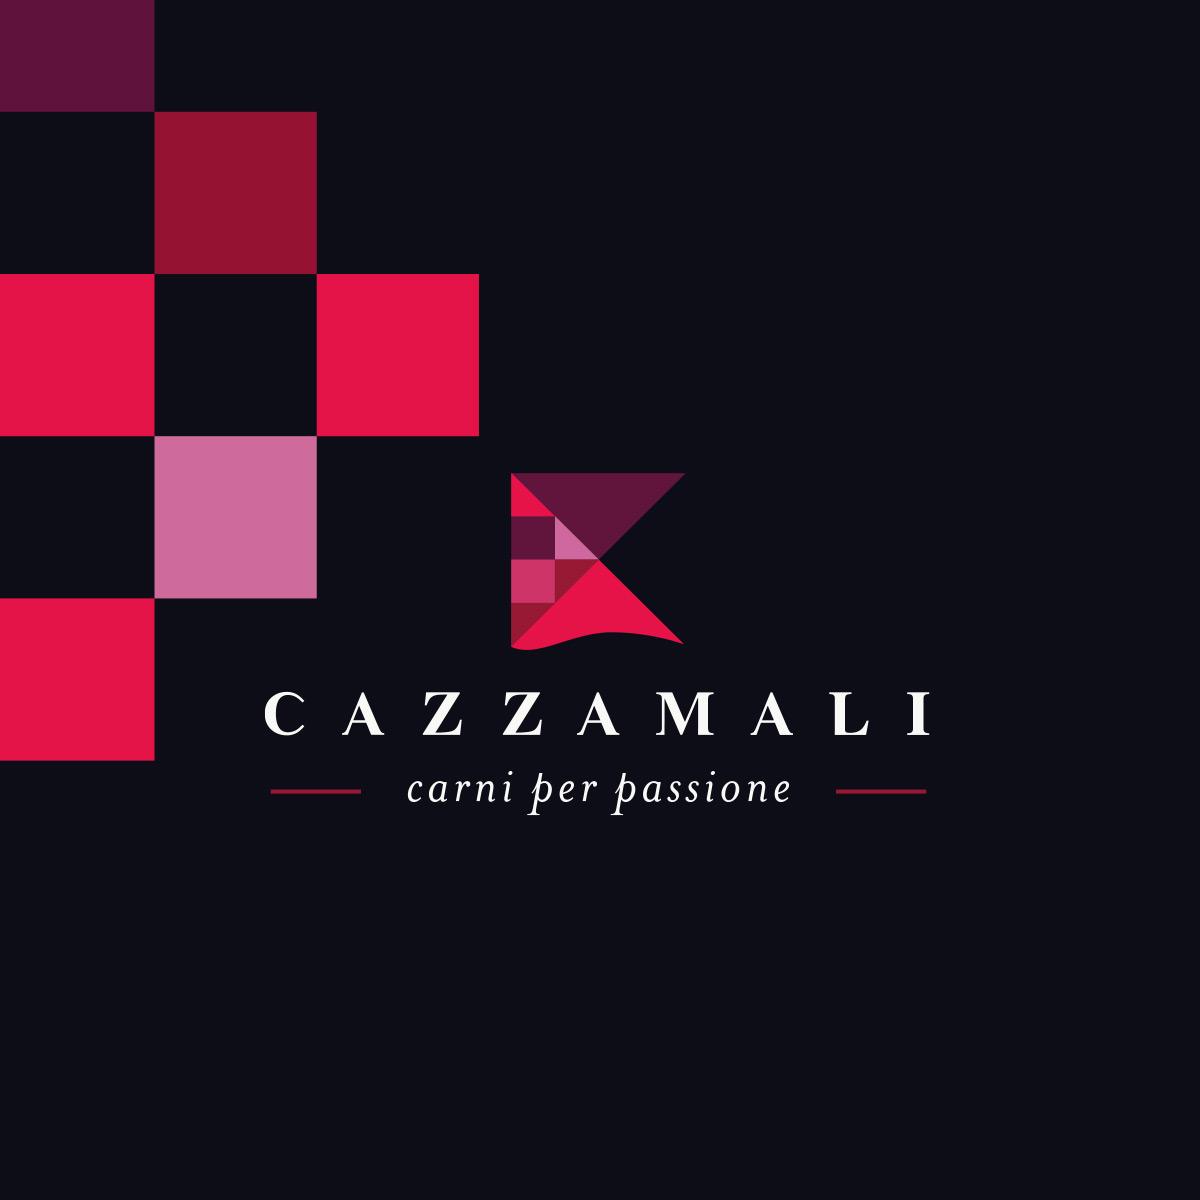 thumbs_cazzamali